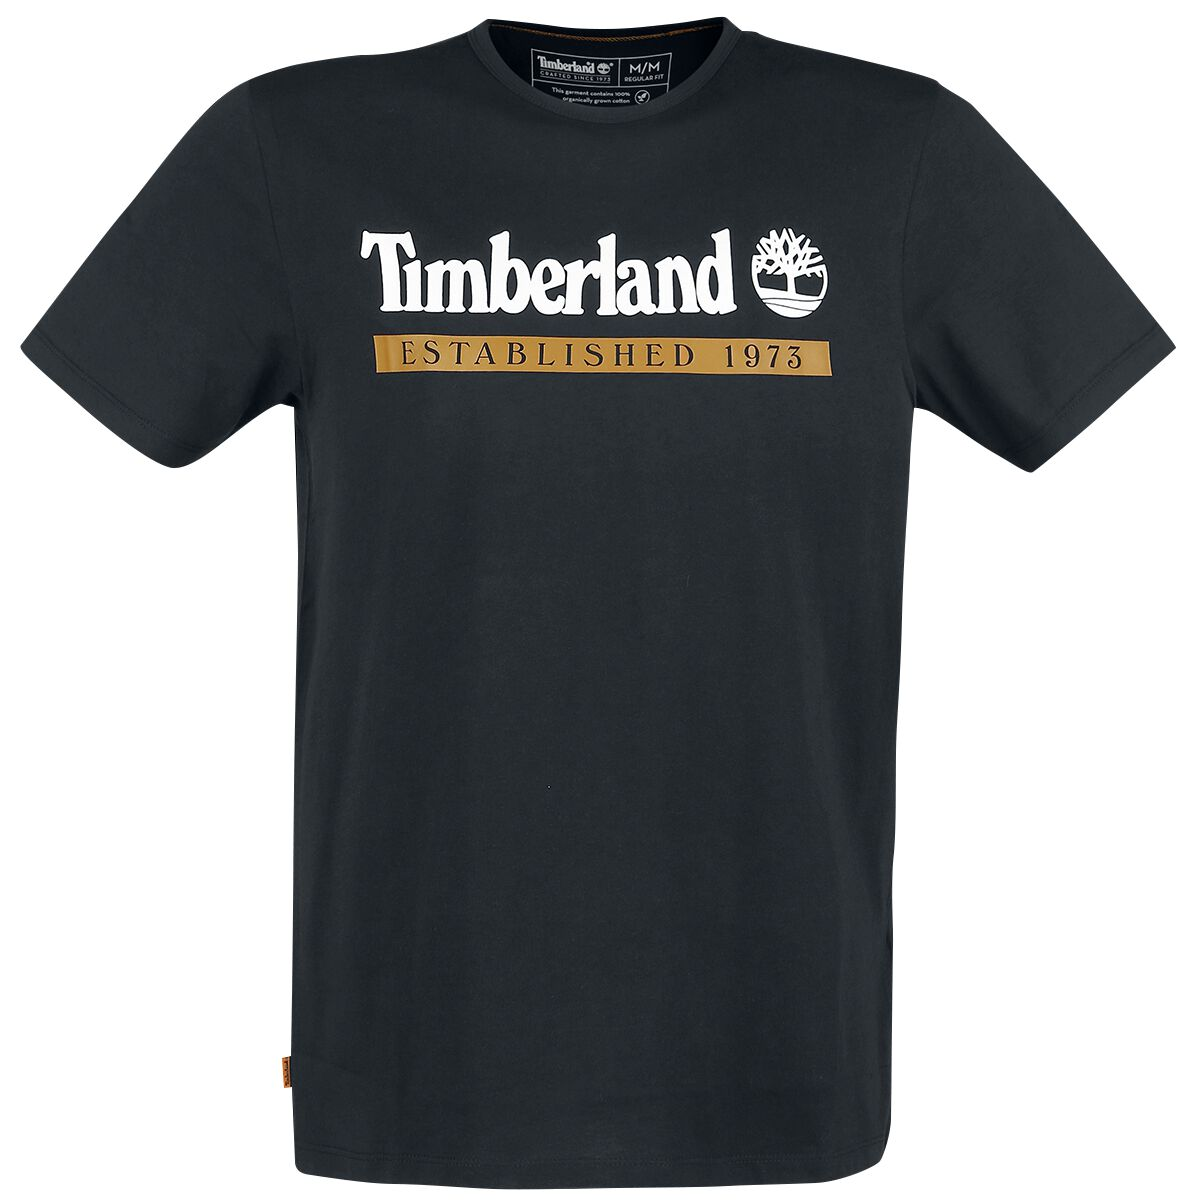 Timberland YC Established 1973 Tee  T-Shirt  schwarz